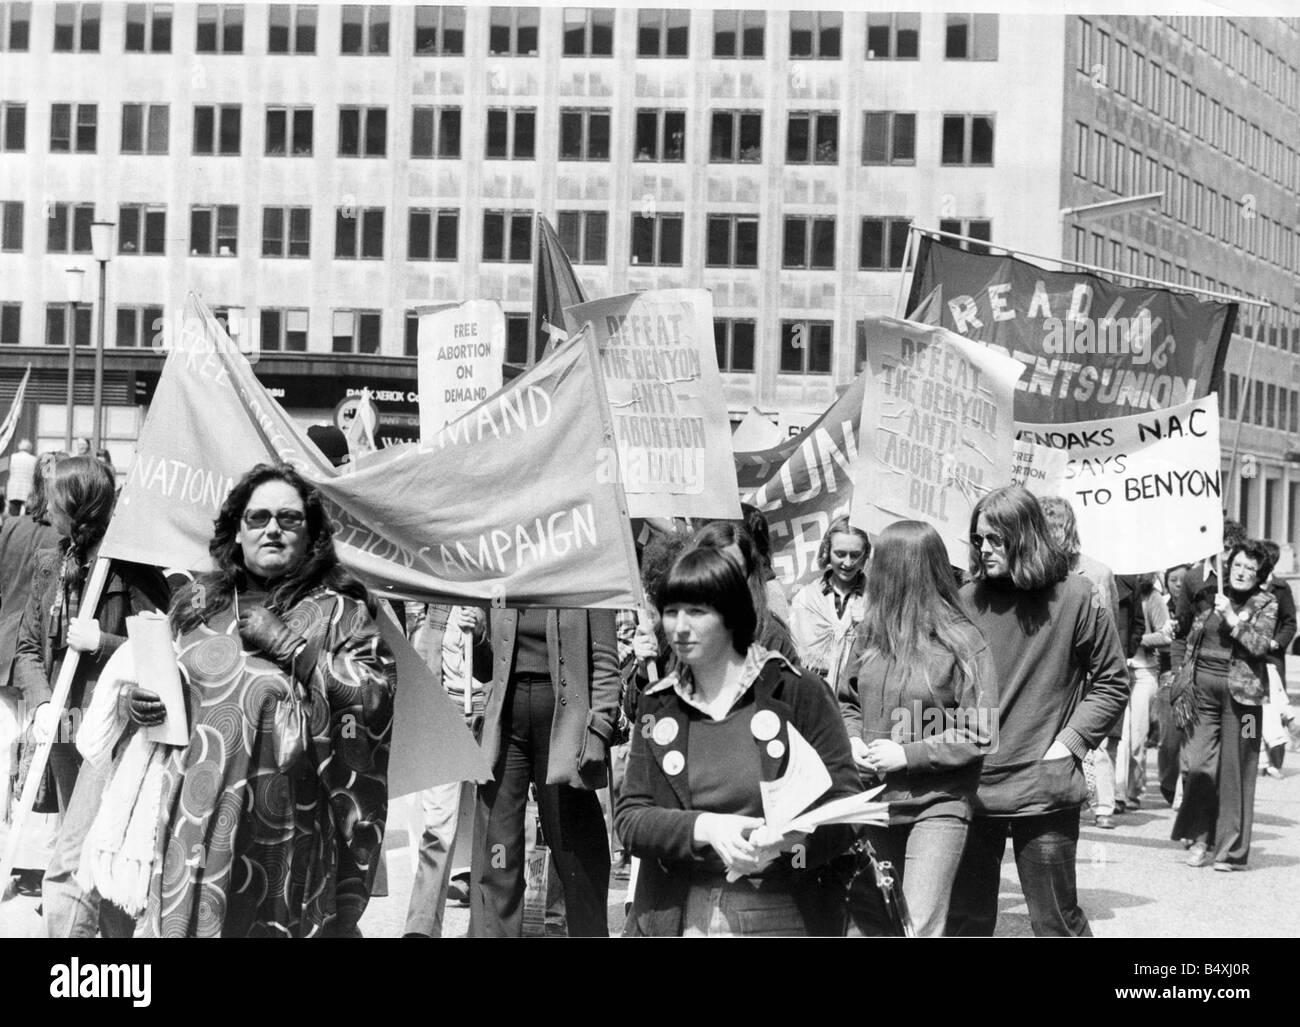 1970s Protest Stockfotos & 1970s Protest Bilder - Alamy